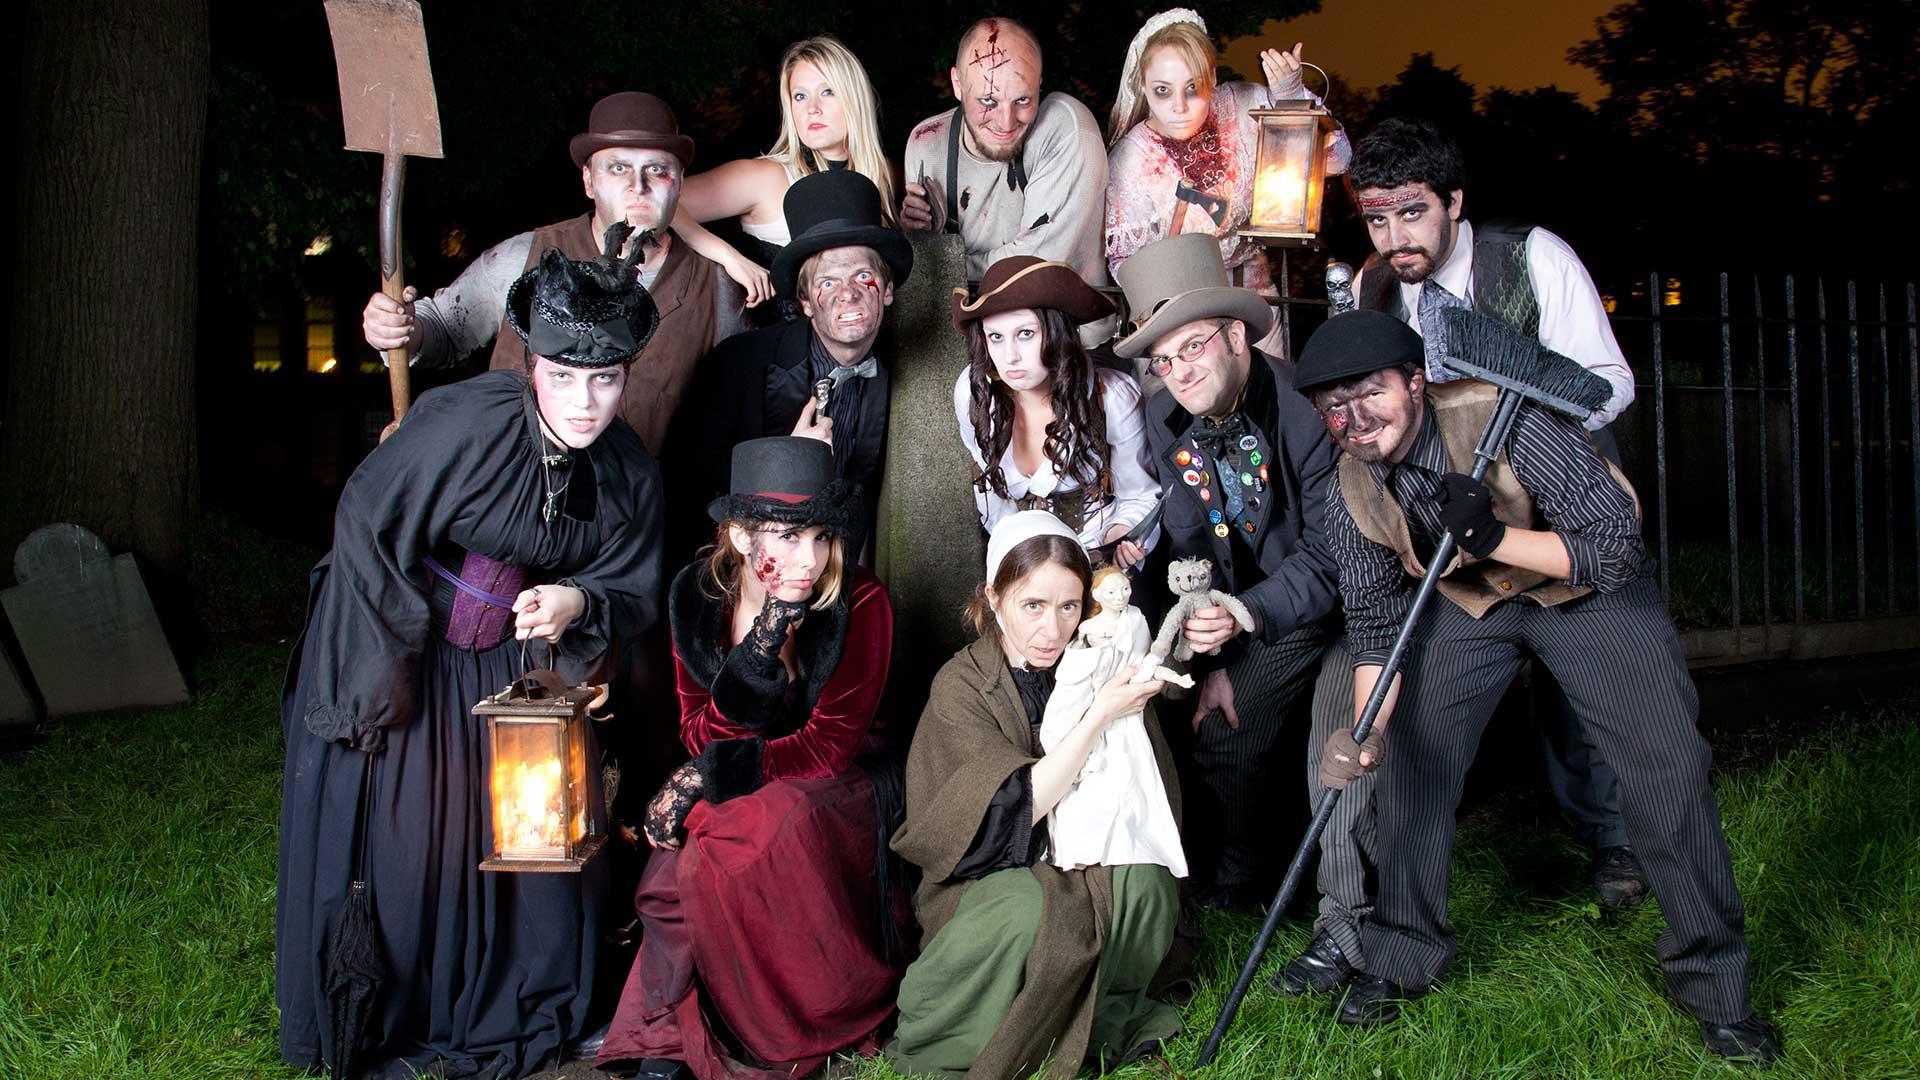 boston haunted tour guides in costume